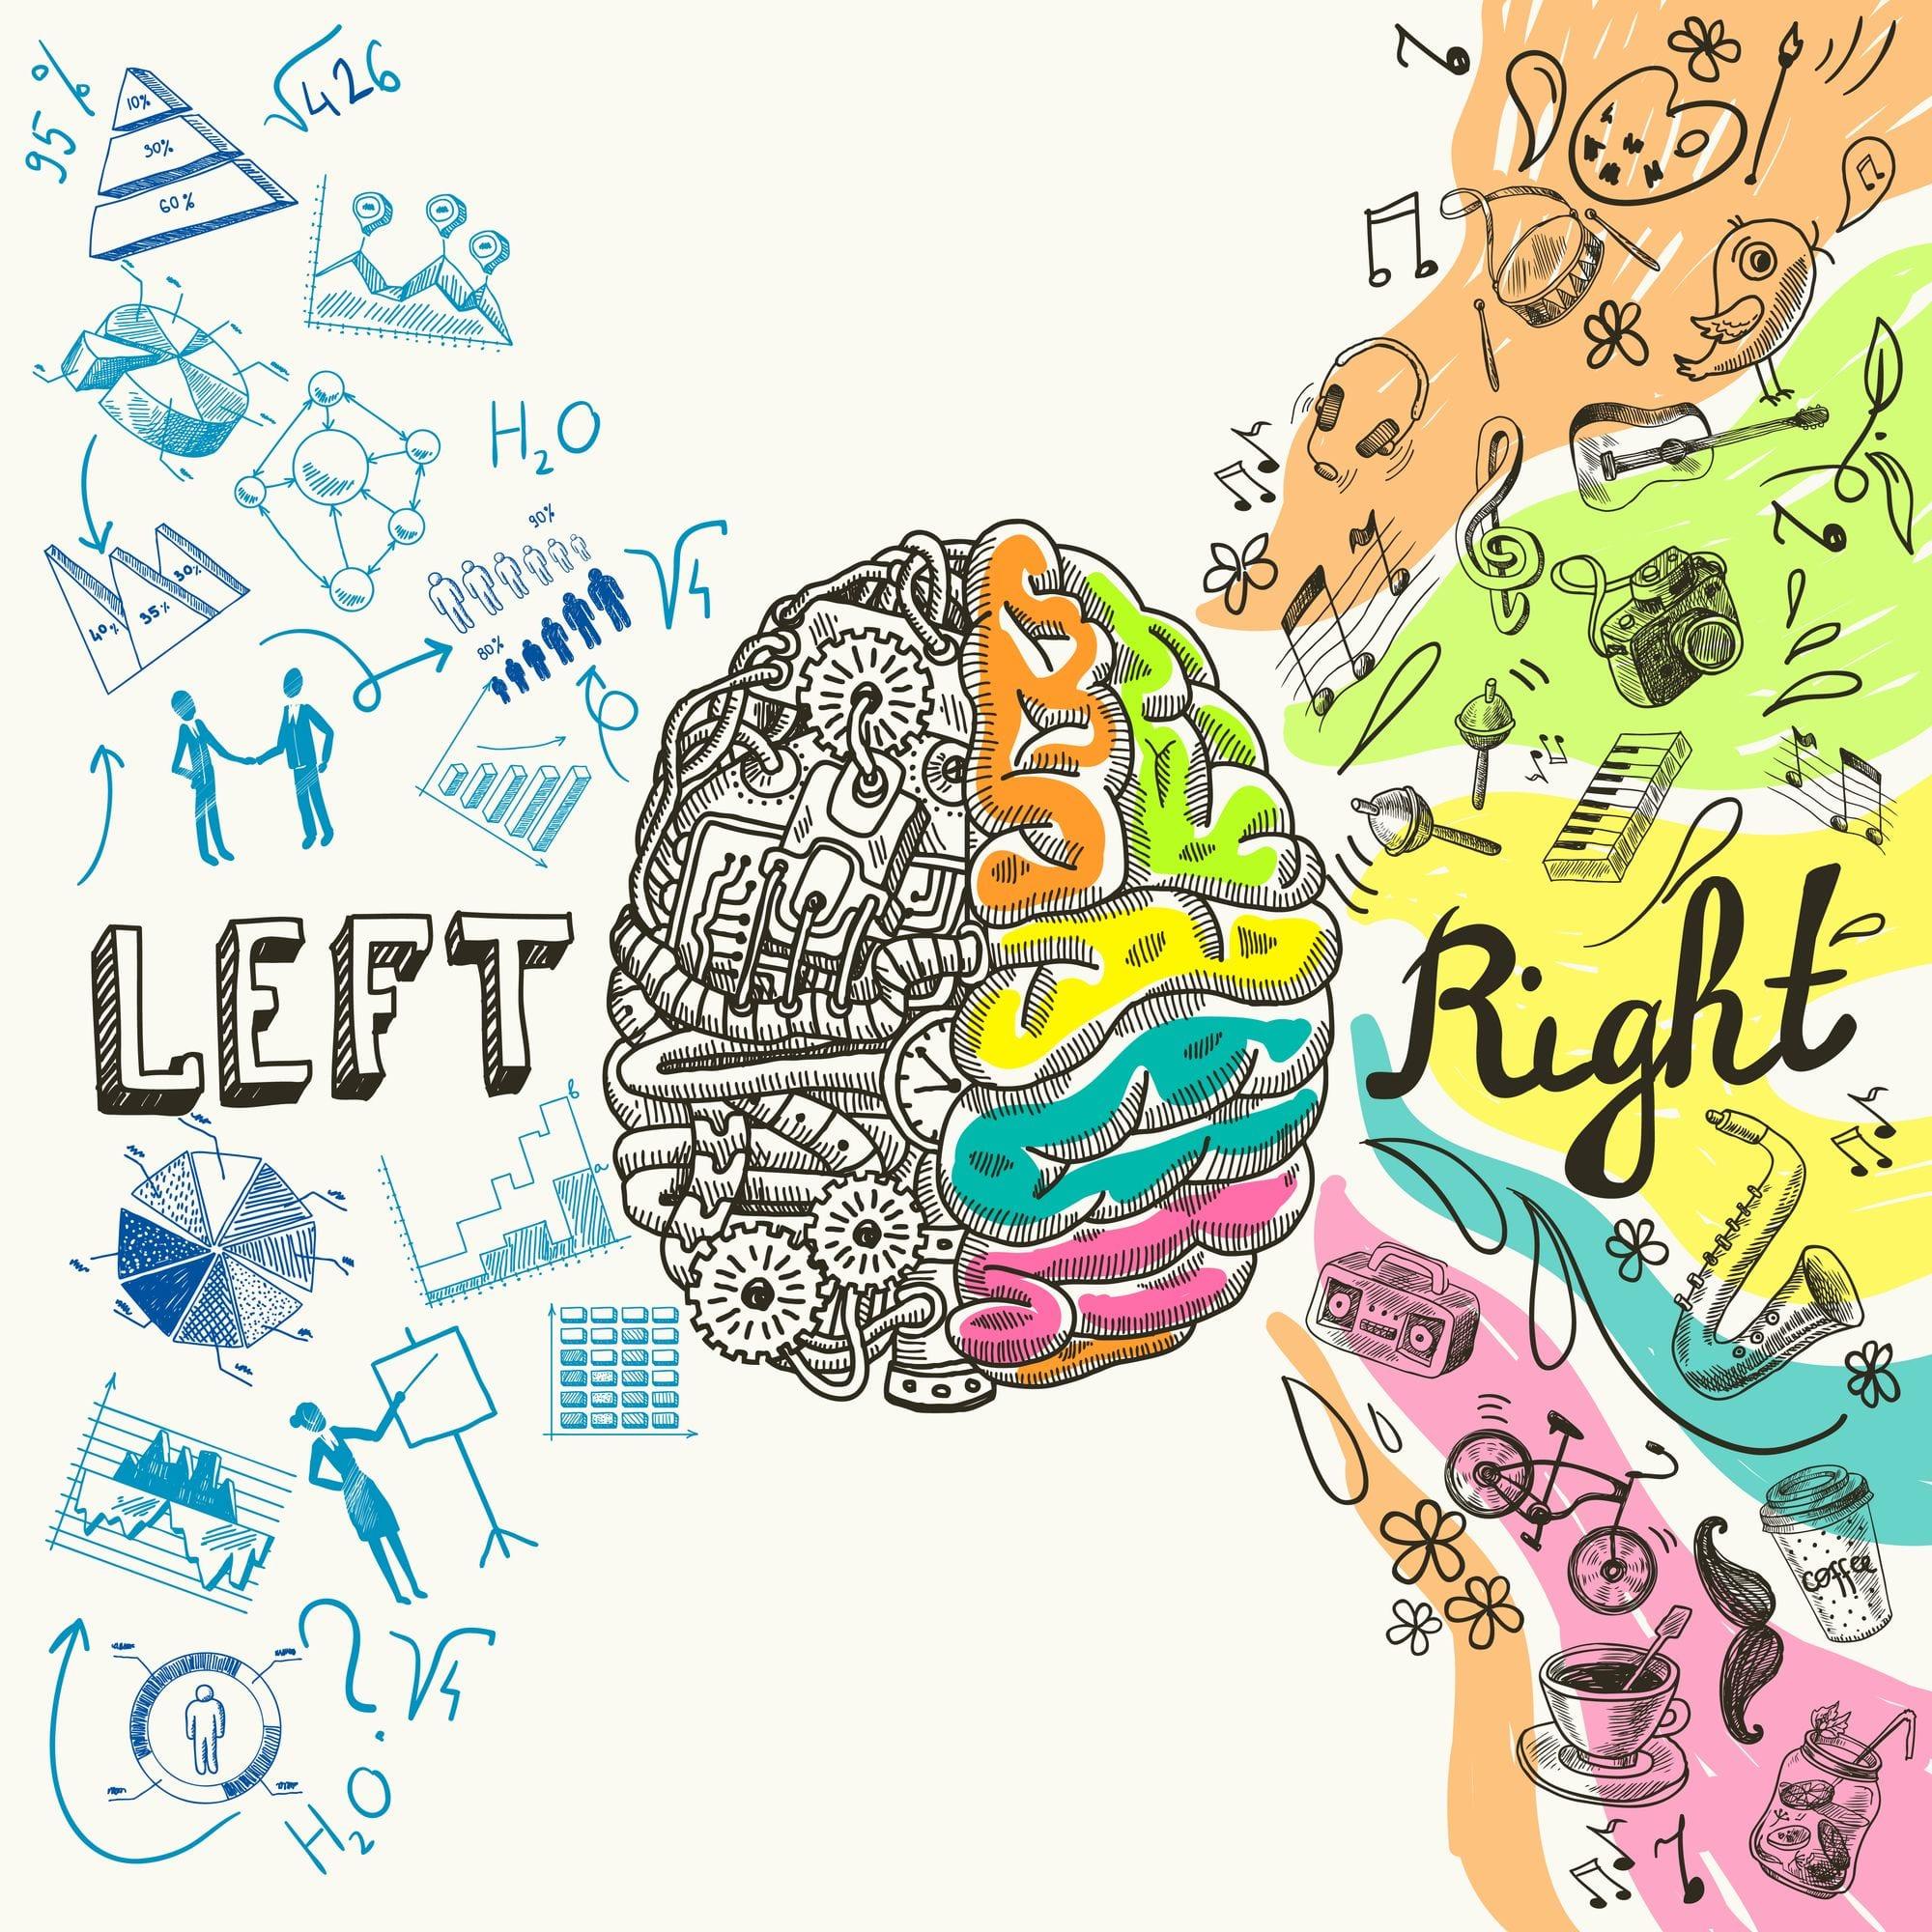 Intelligenza - emisfero sinistro ed emisfero destro